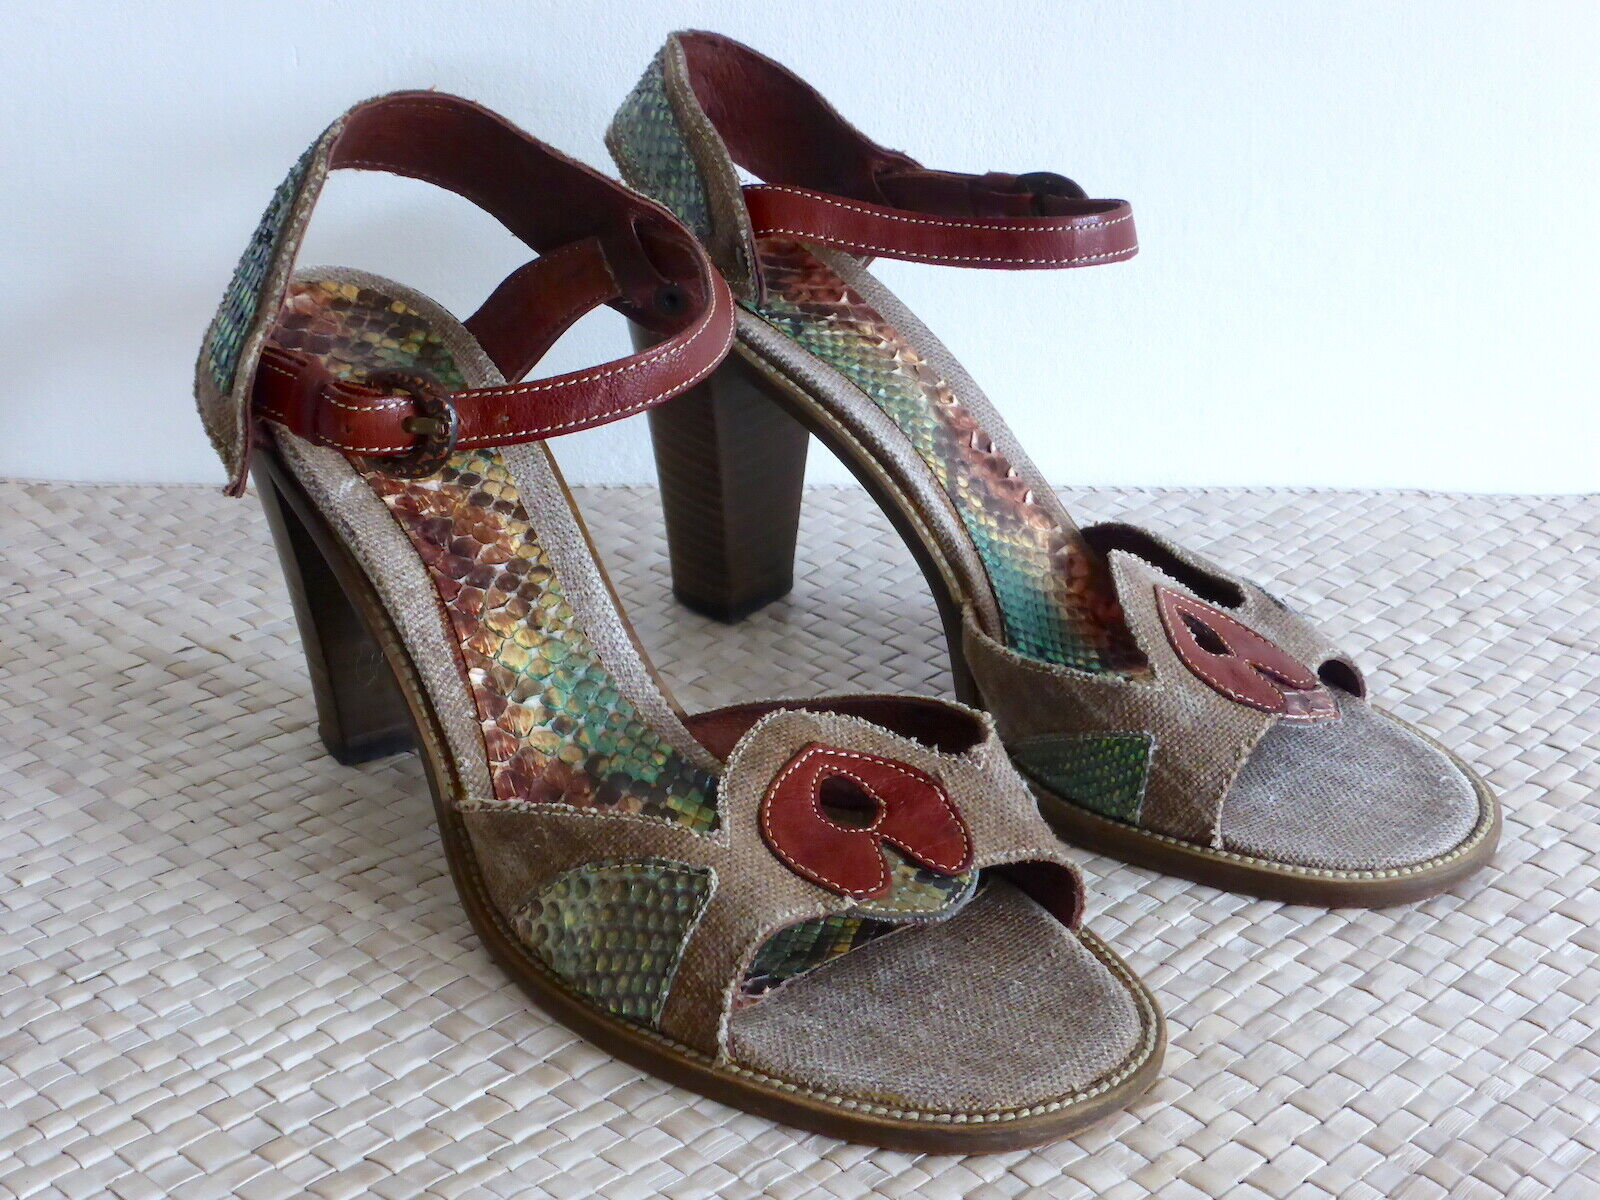 Vic Matié-Sandali heel-sandals, RETTILE OTTICA Iuta pelle multicolour tg. 41